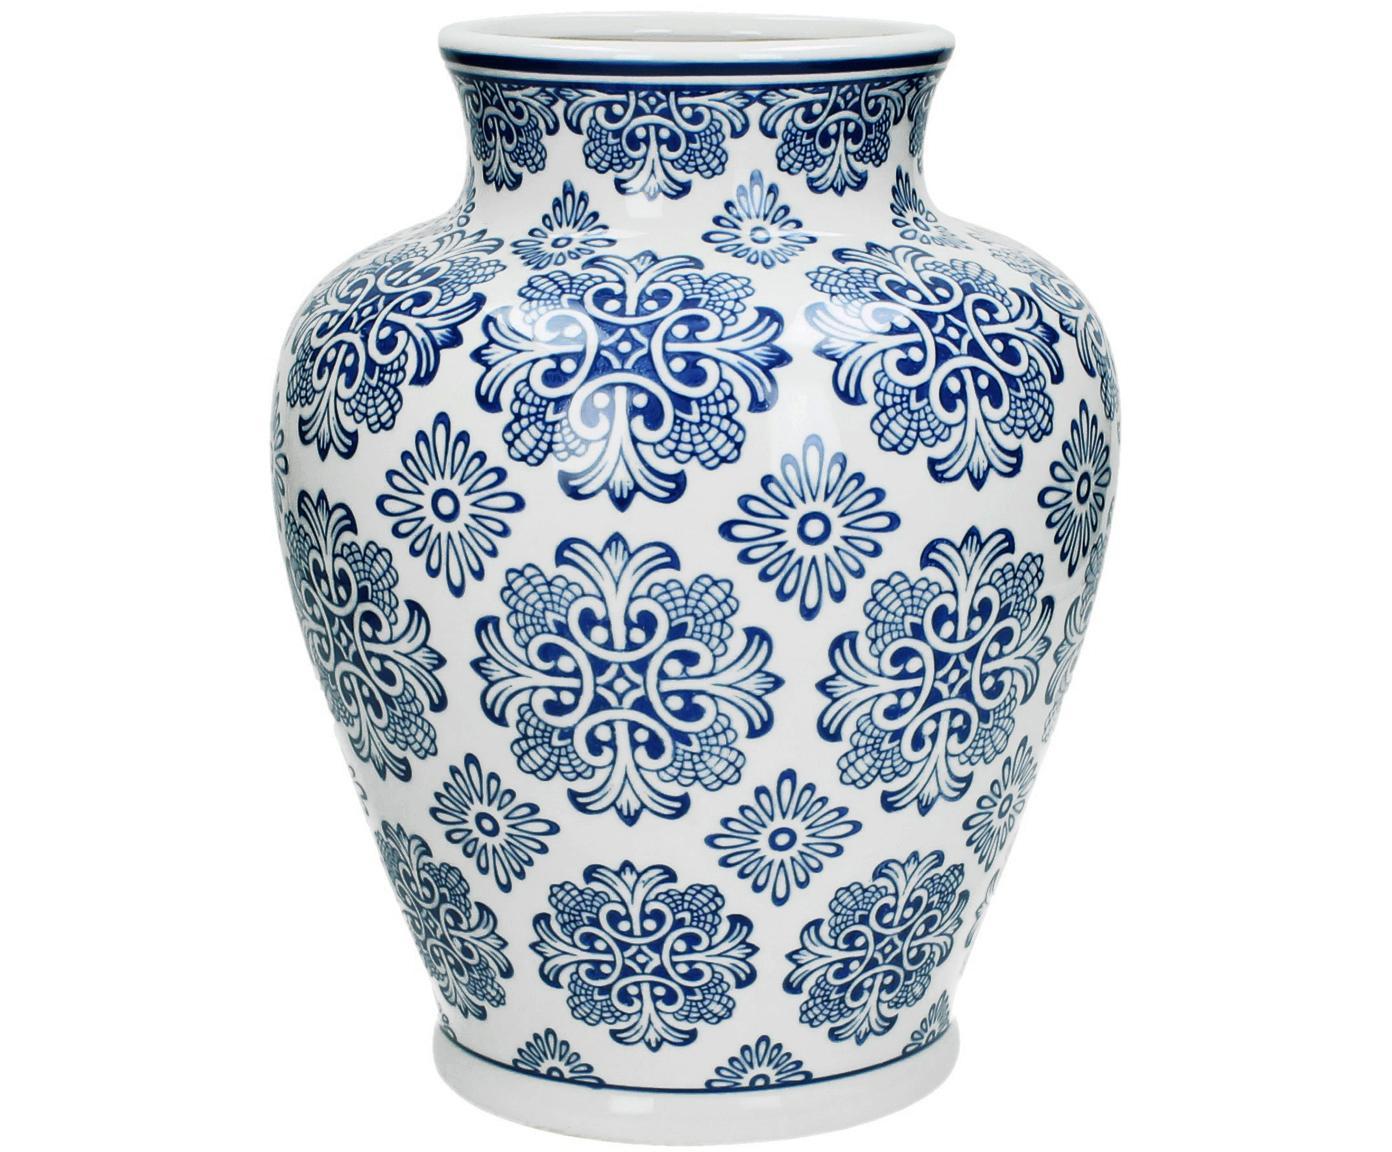 Jarrón de porcelana Lin, Porcelana, no impermeable, Blanco, azul, Ø 21 x Al 28 cm